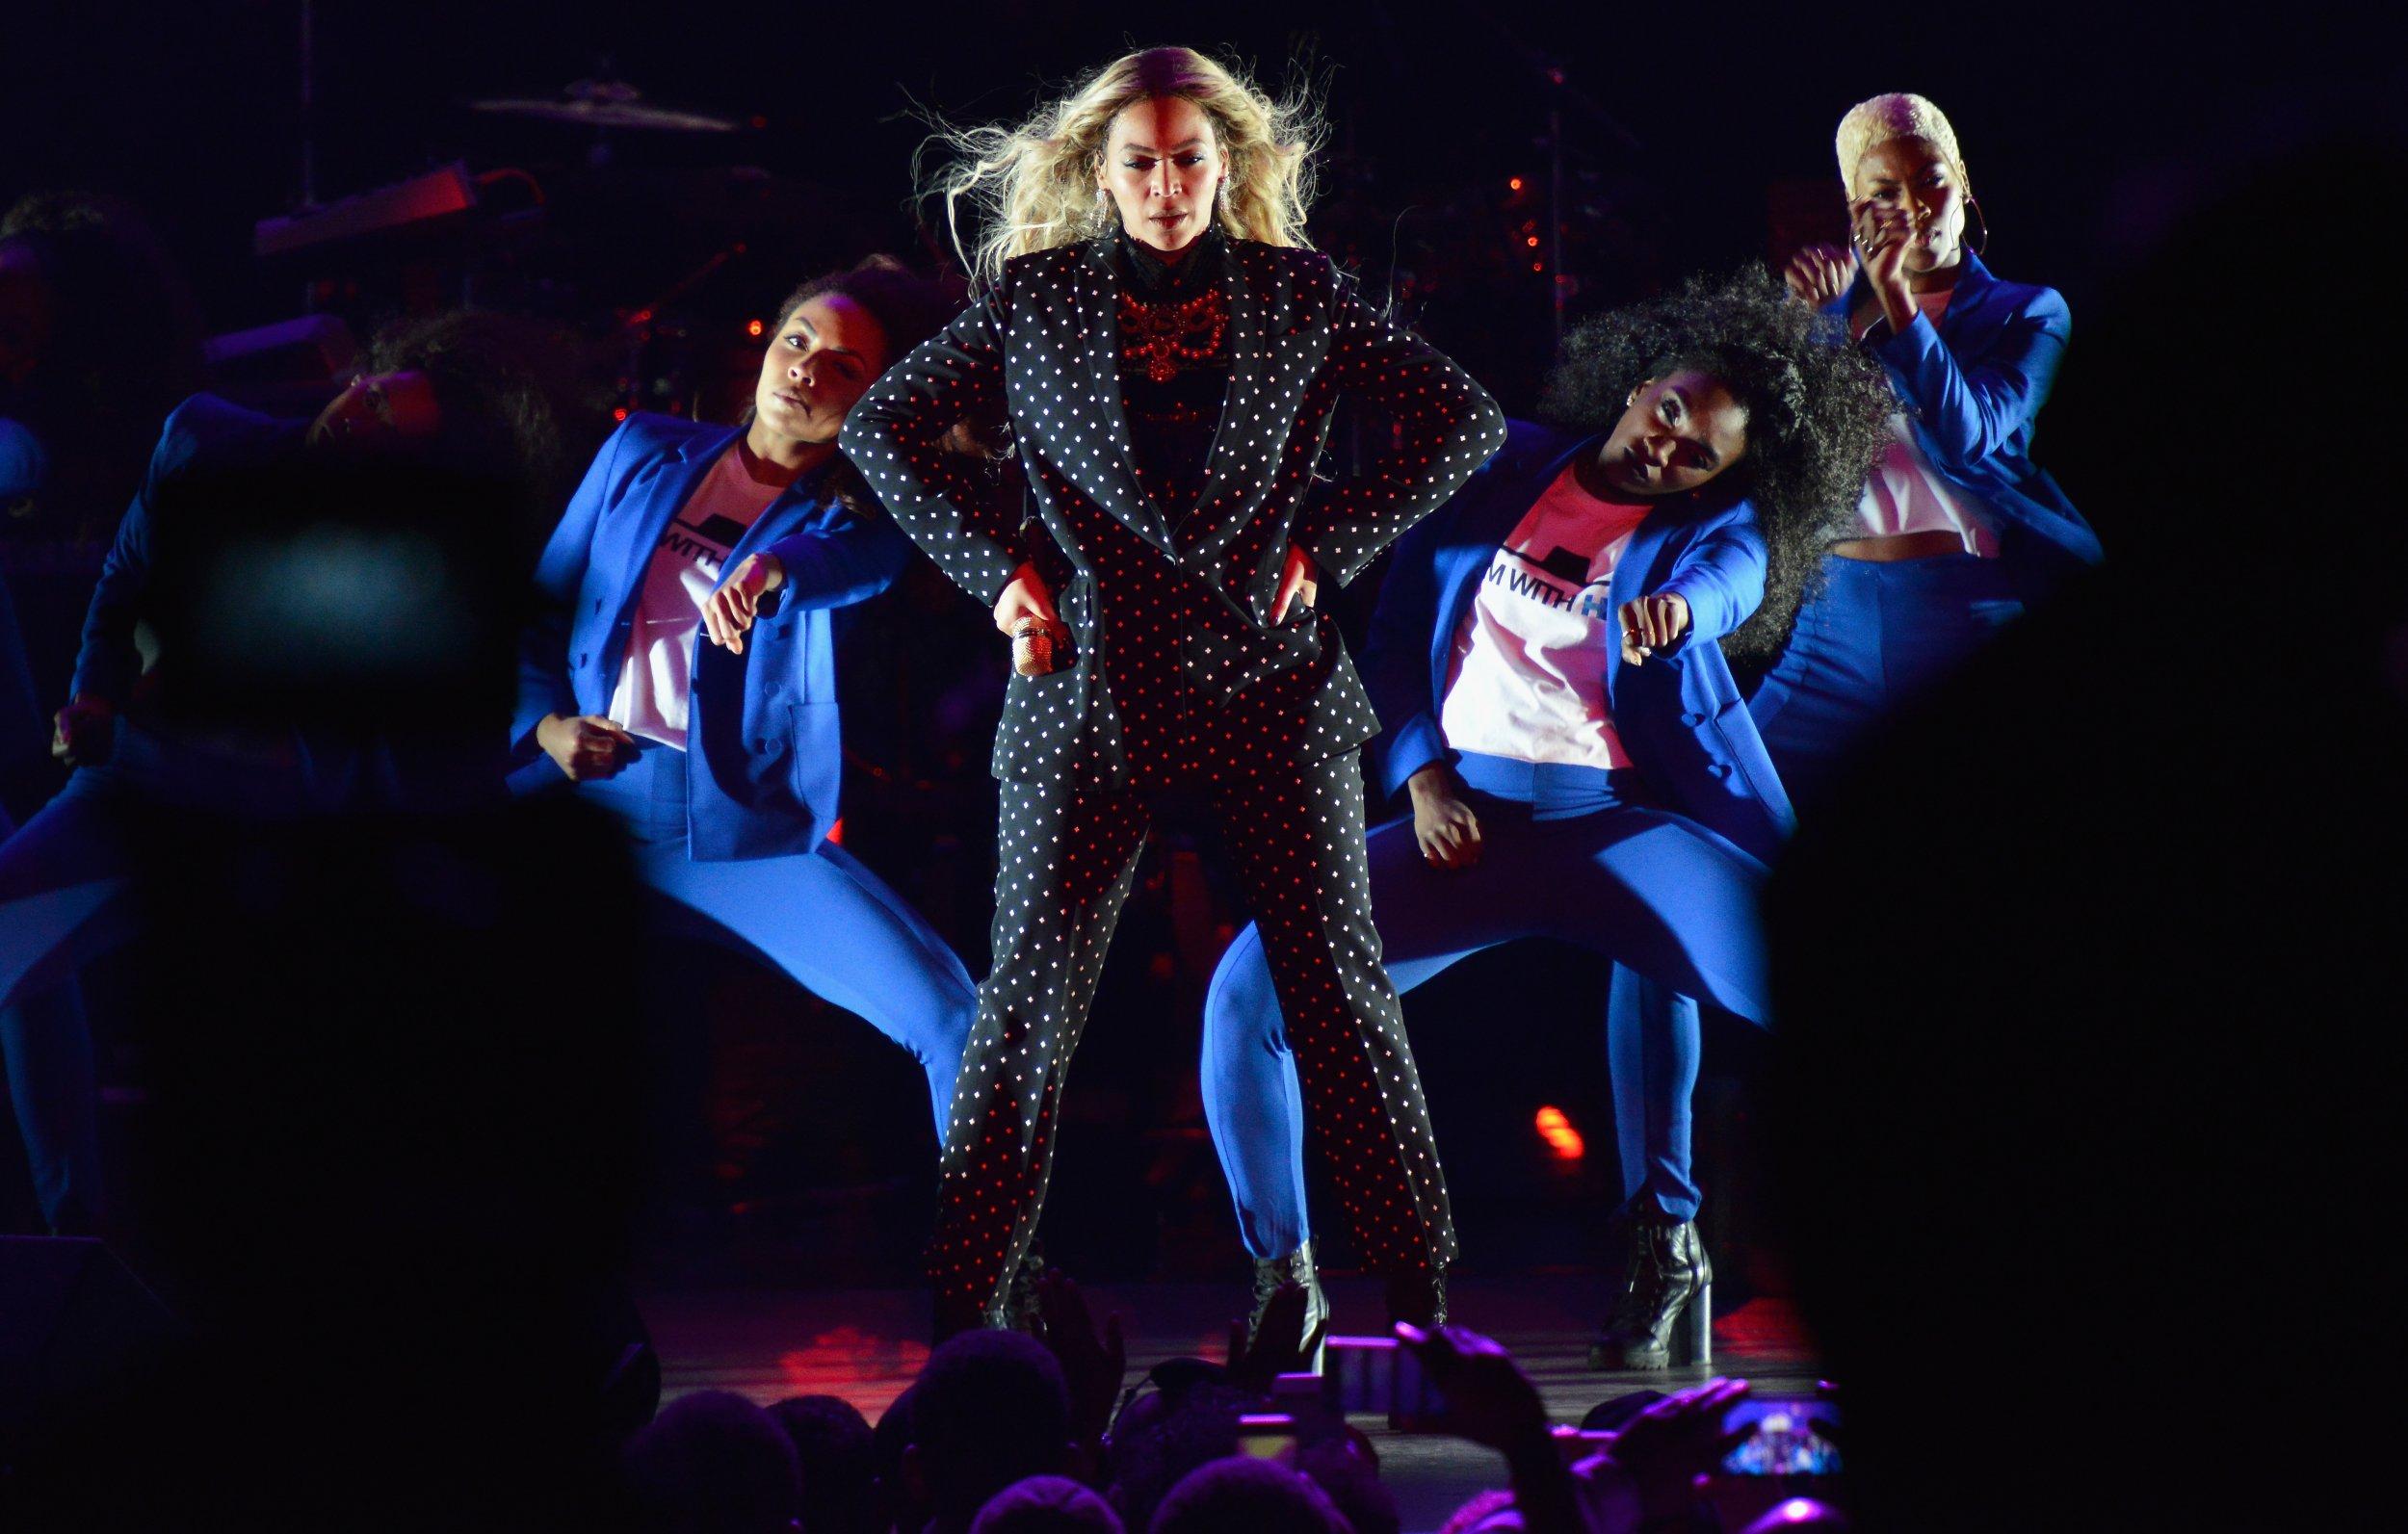 Beyonce performs